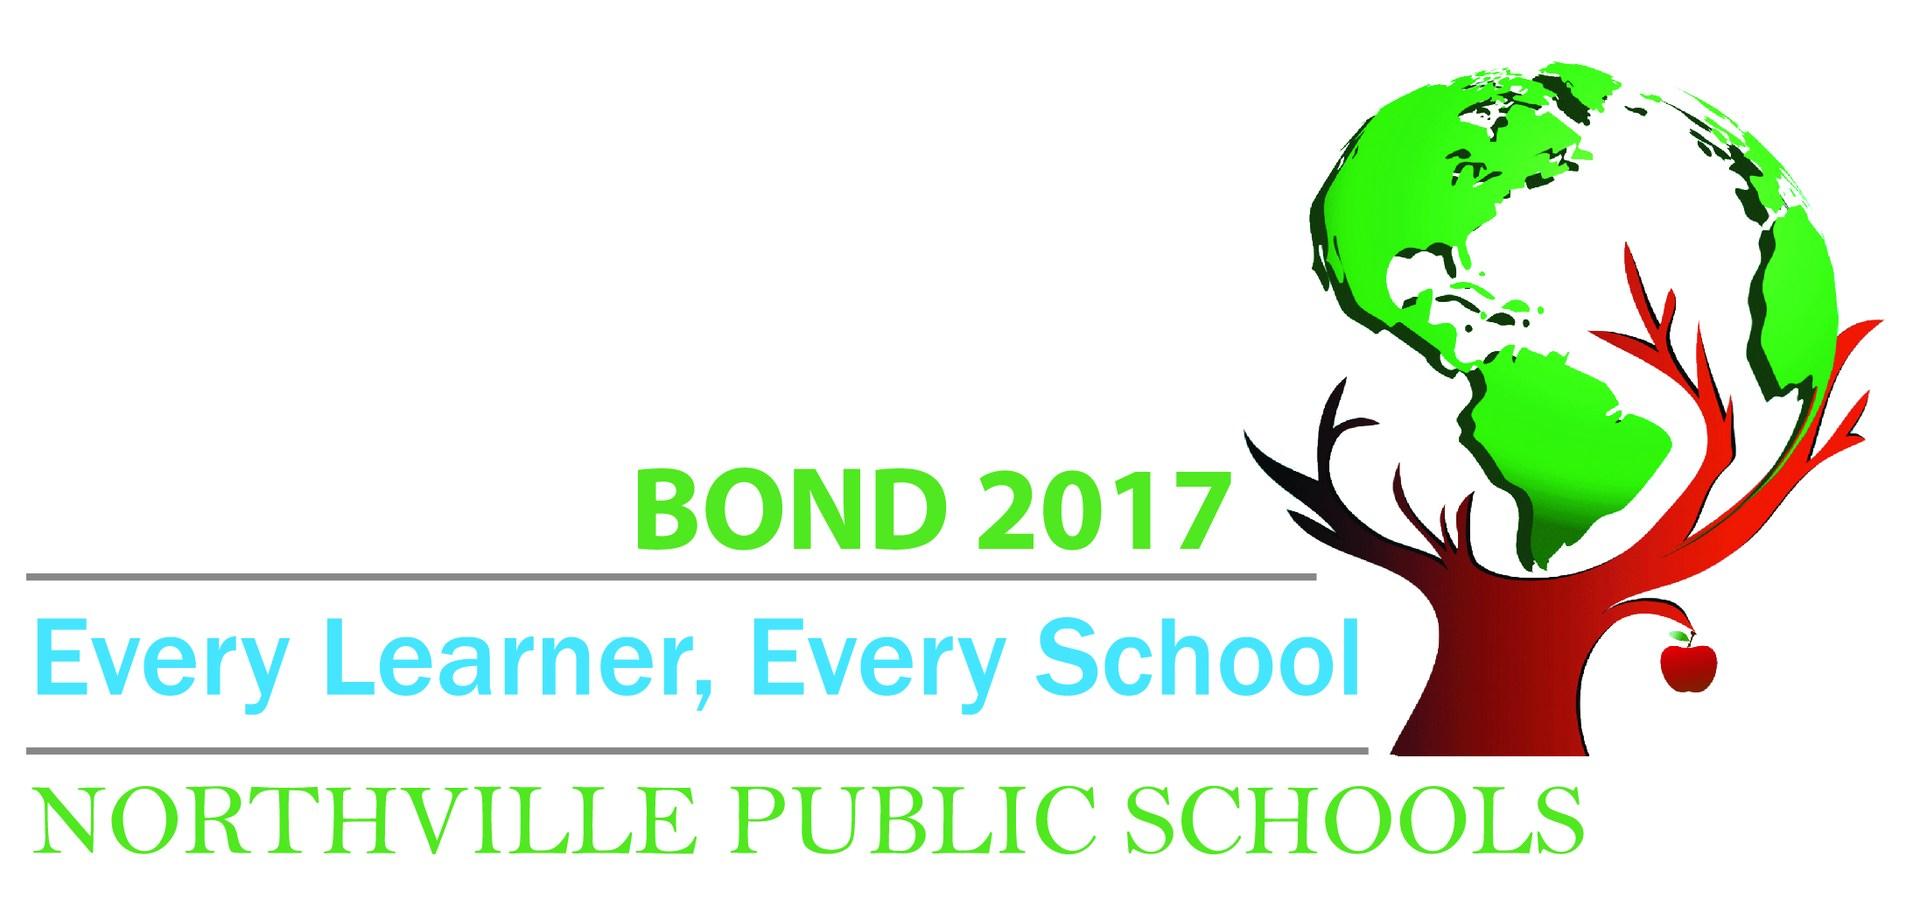 Bond 2017 Logo